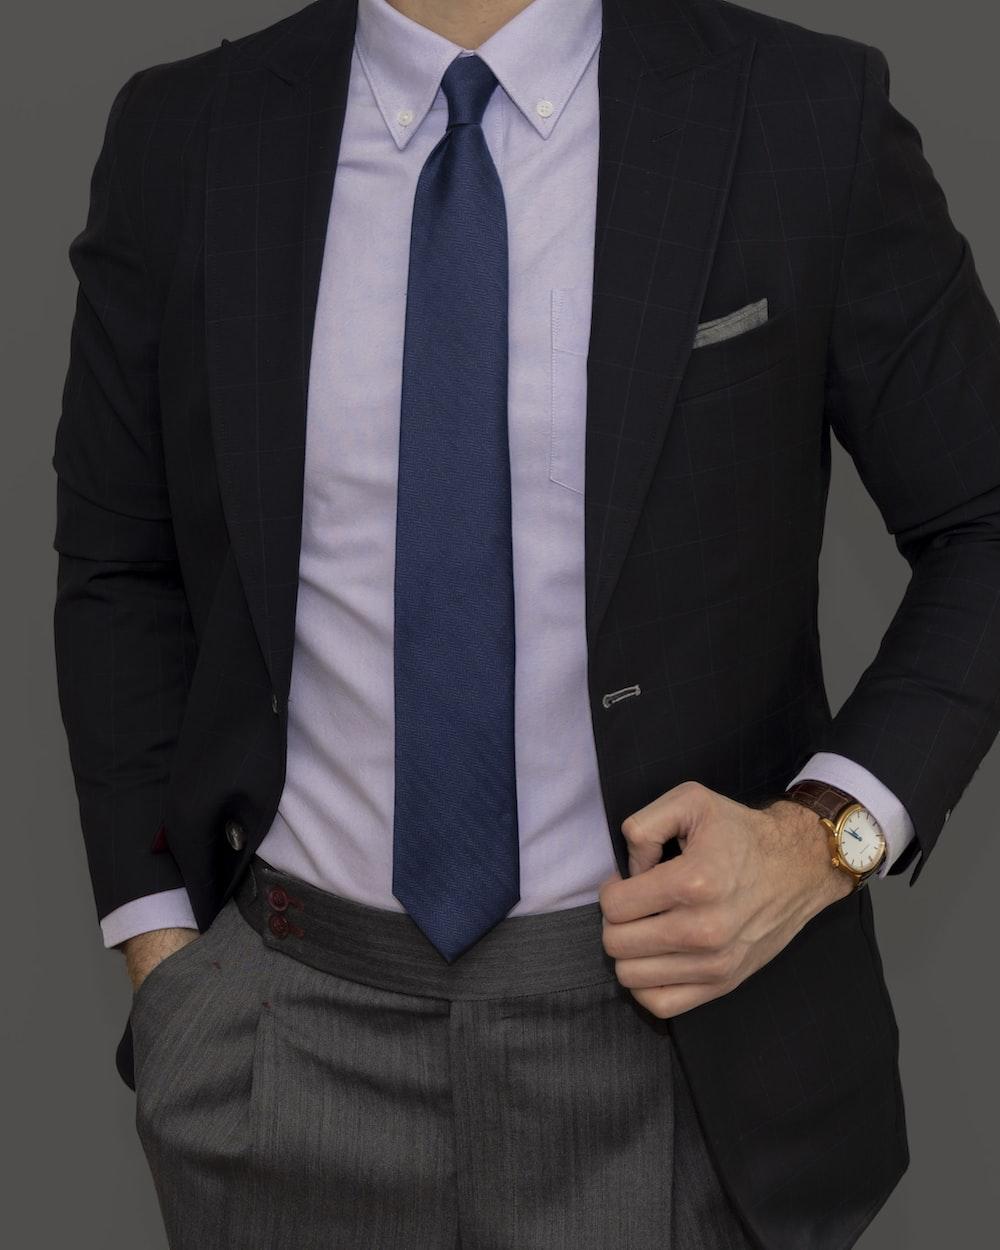 man in black suit jacket and blue necktie